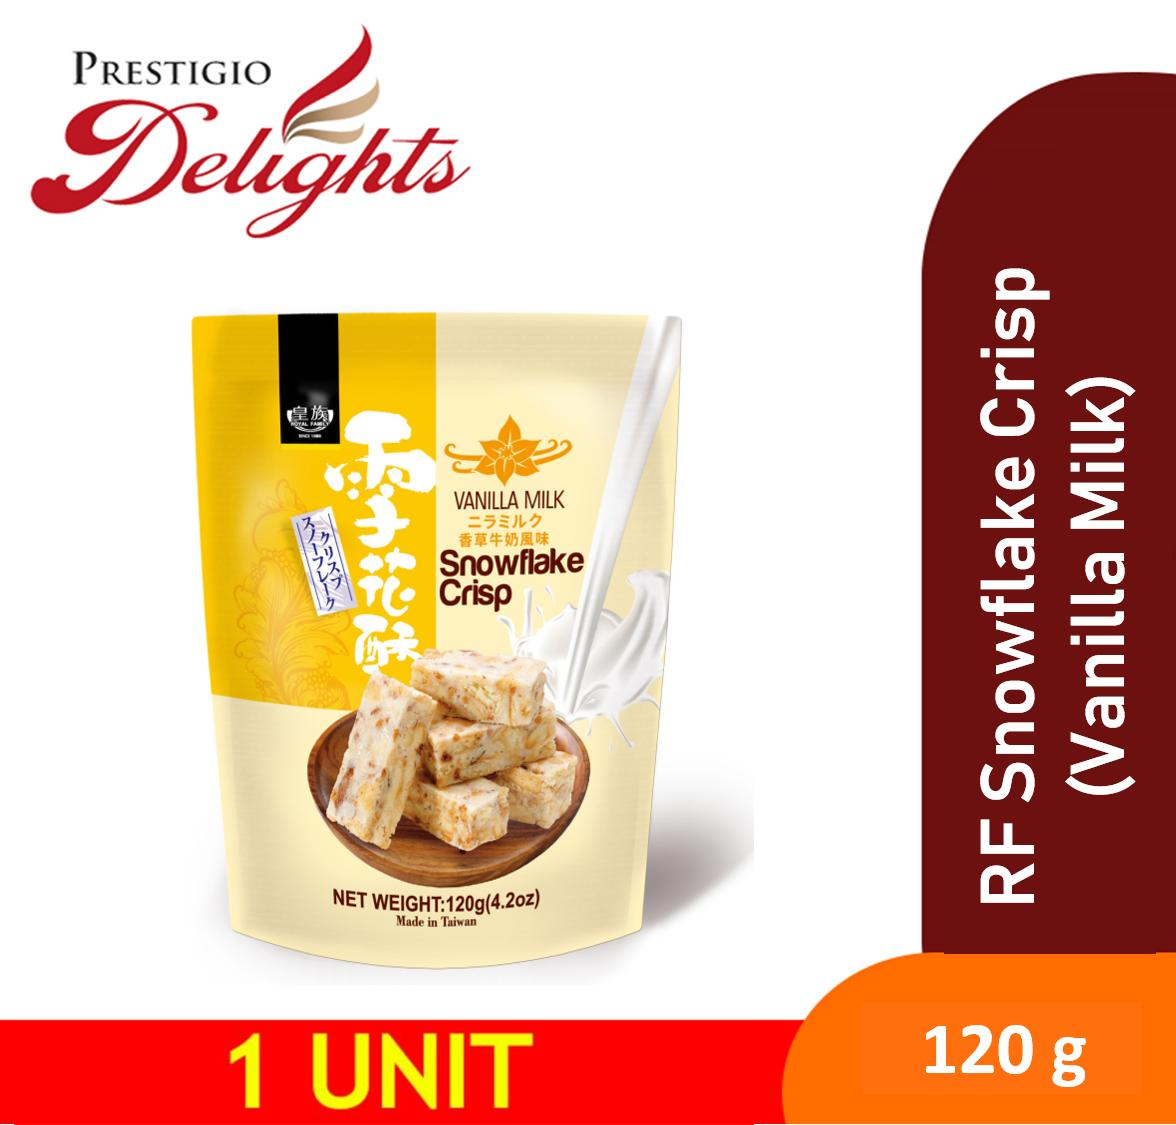 Royal Family Snowflake Crisp (vanilla Milk) 120g 雪花酥-牛奶 By Prestigio Delights.